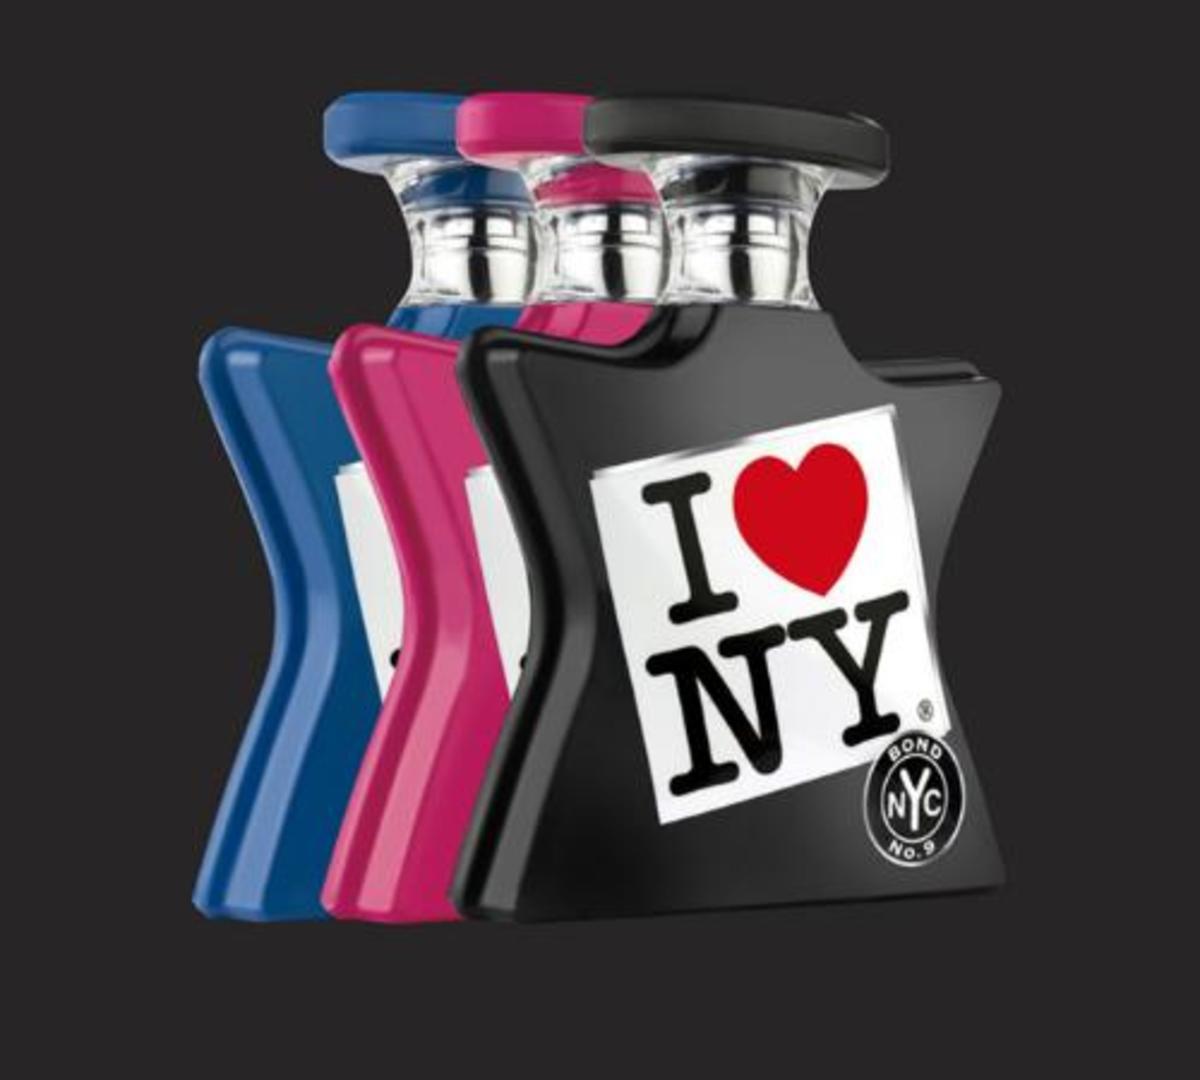 20110901130531ENPRNPRN-BOND-NO-9-I-LOVE-NEW-YORK-90-1314882331MR